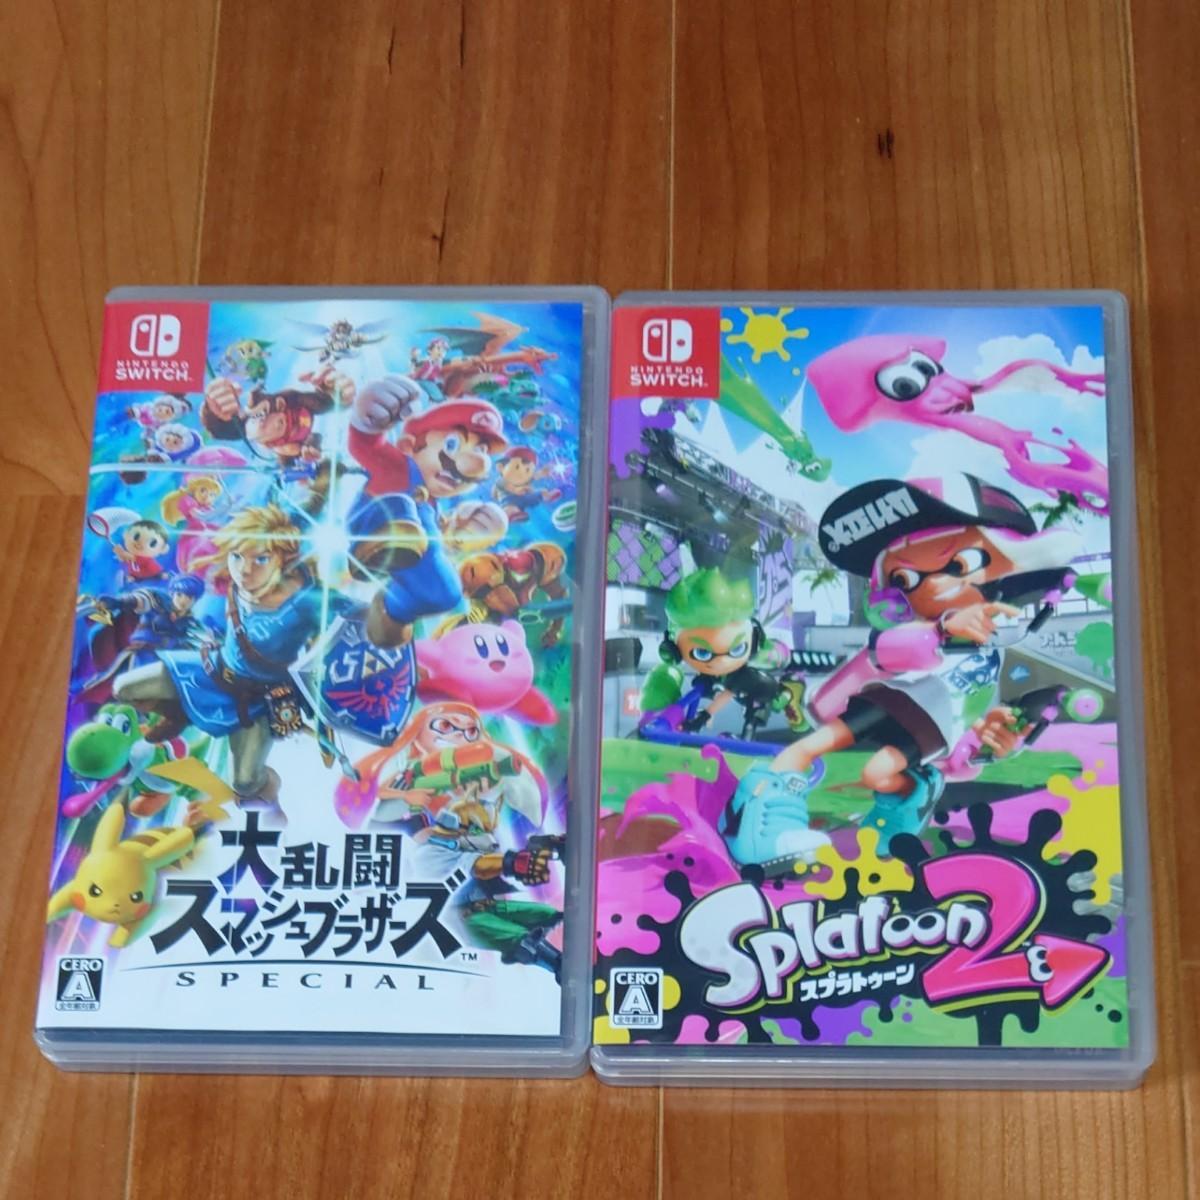 Nintendo Switch 大乱闘スマッシュブラザーズSPECIAL スプラトゥーン2 セット